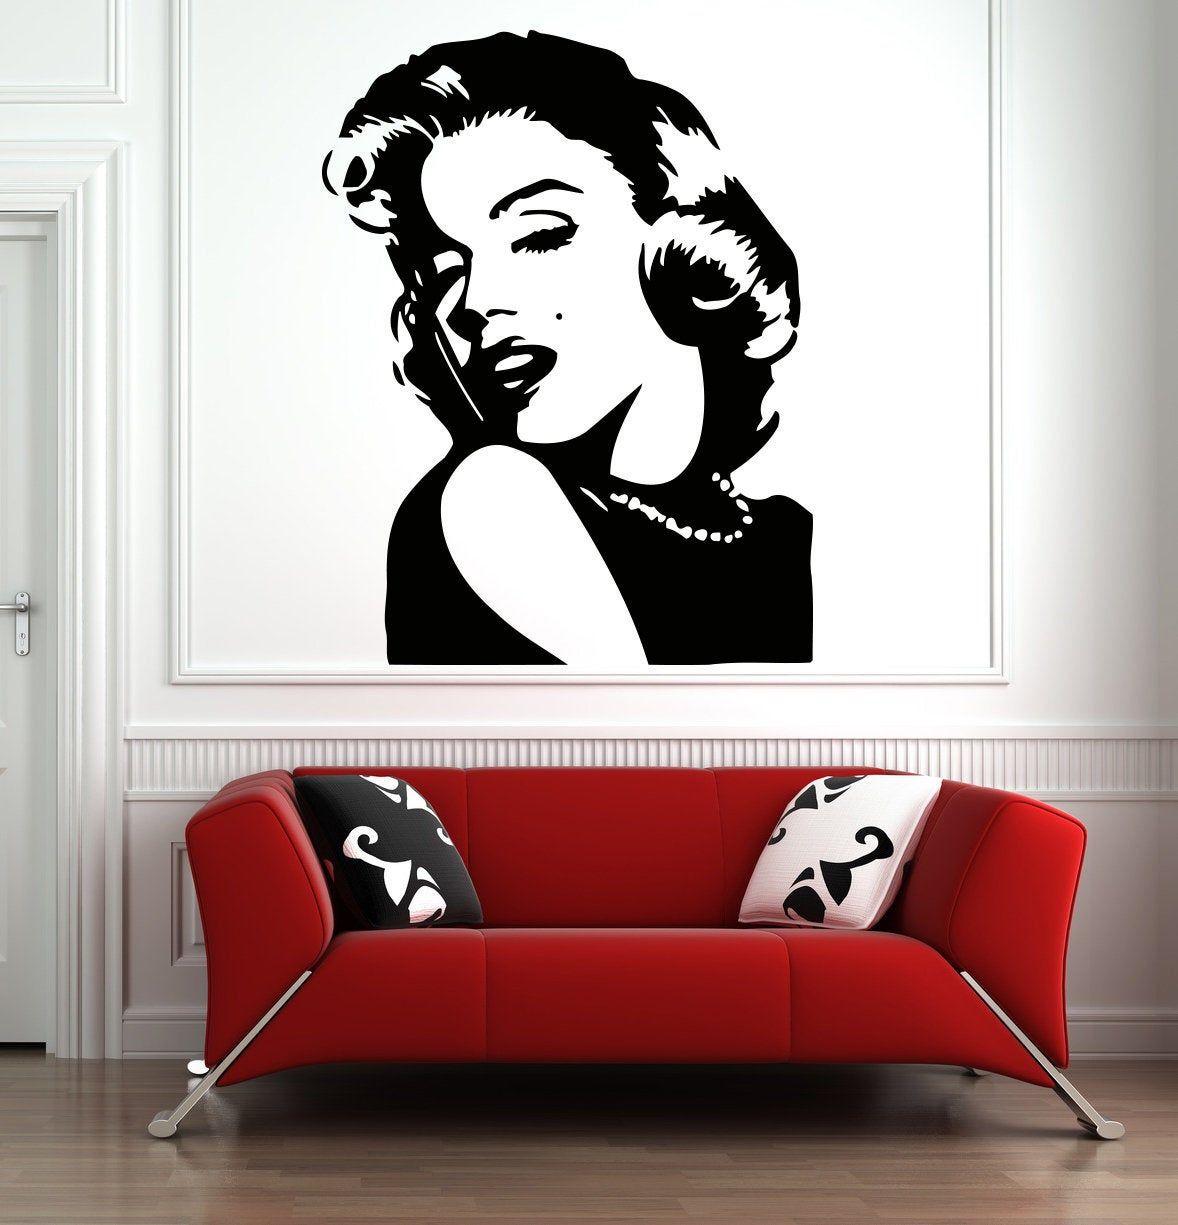 Marilyn Monroe Wall Decal Beautiful Woman Wall Decor Beauty Etsy In 2021 Salon Wall Art Girls Wall Stickers Wall Decals